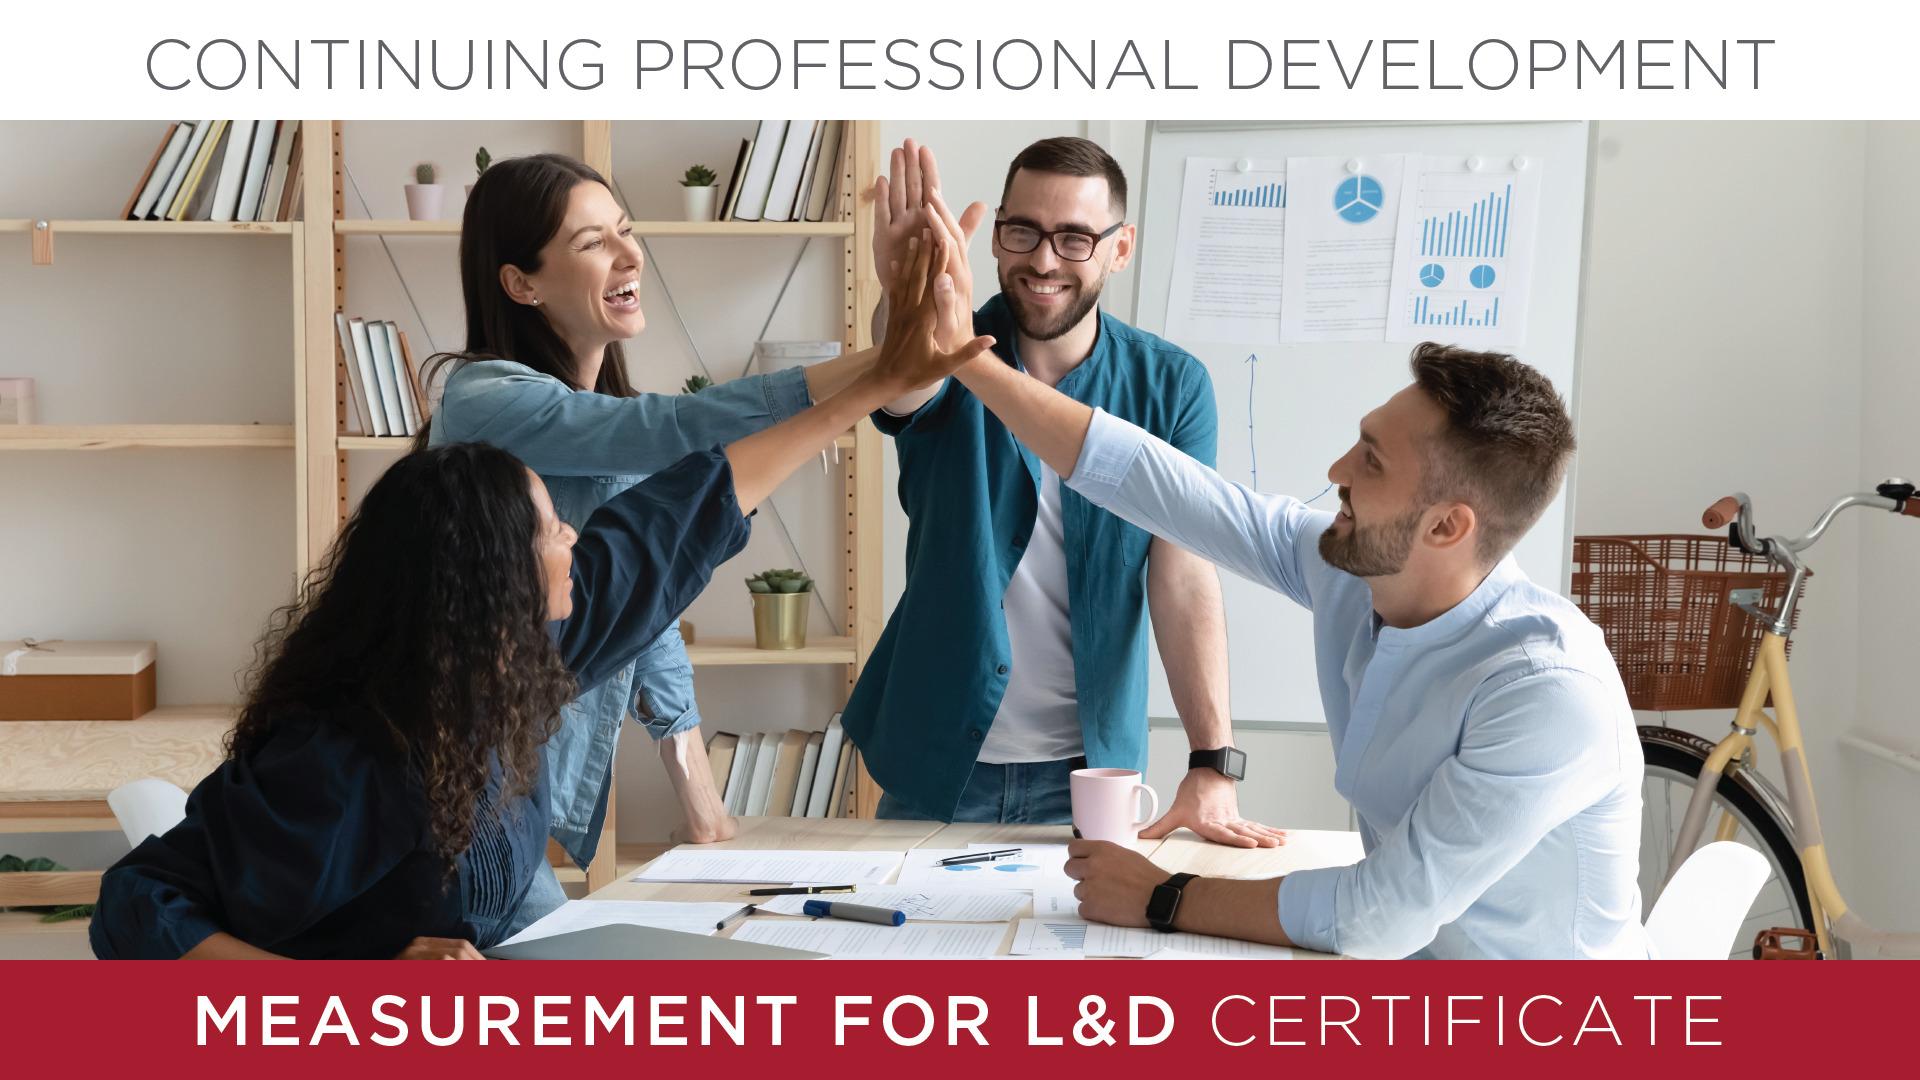 Measurement for L&D Certificate